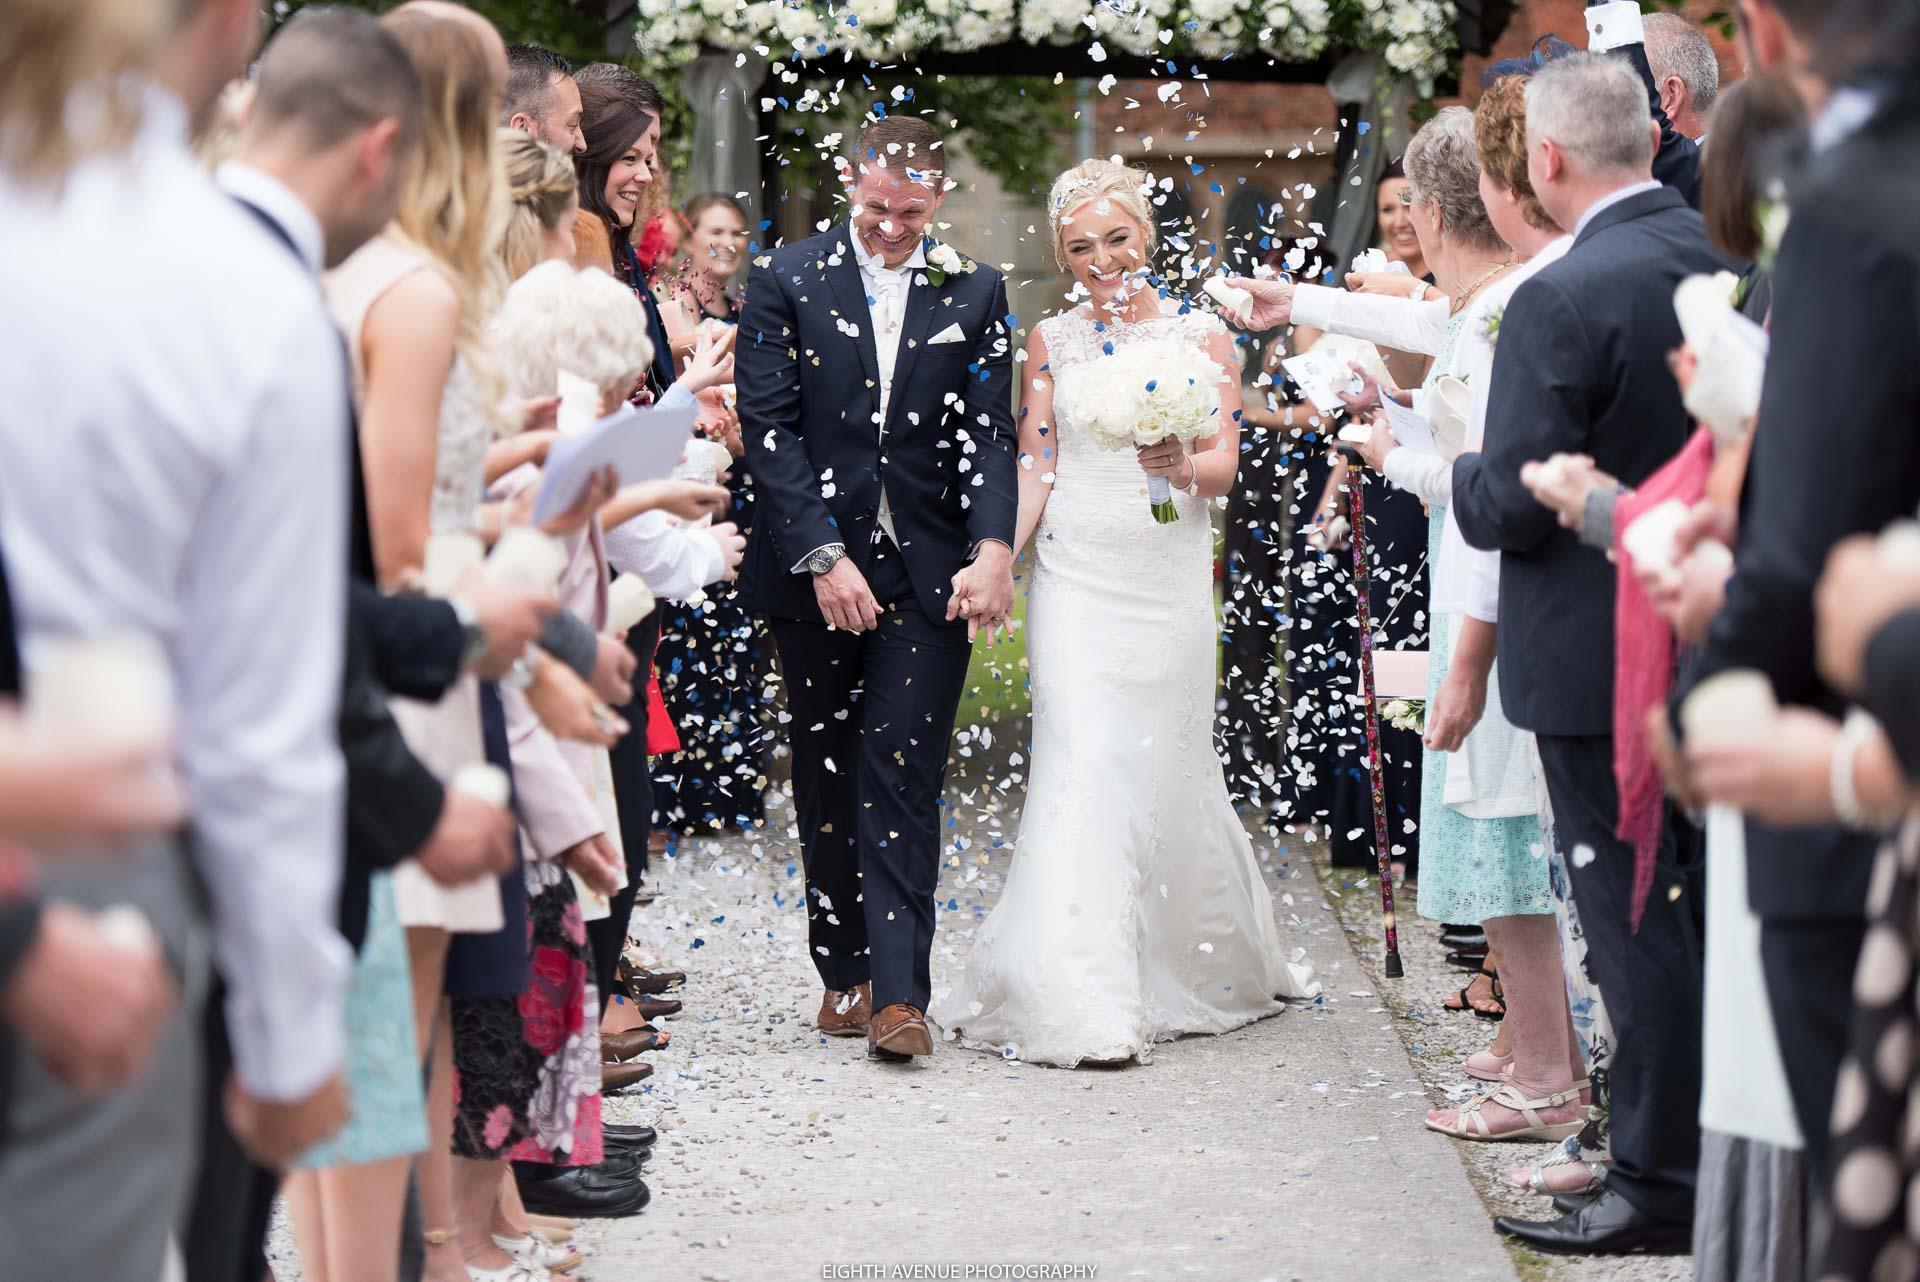 Bride and groom walking through confetti outside church